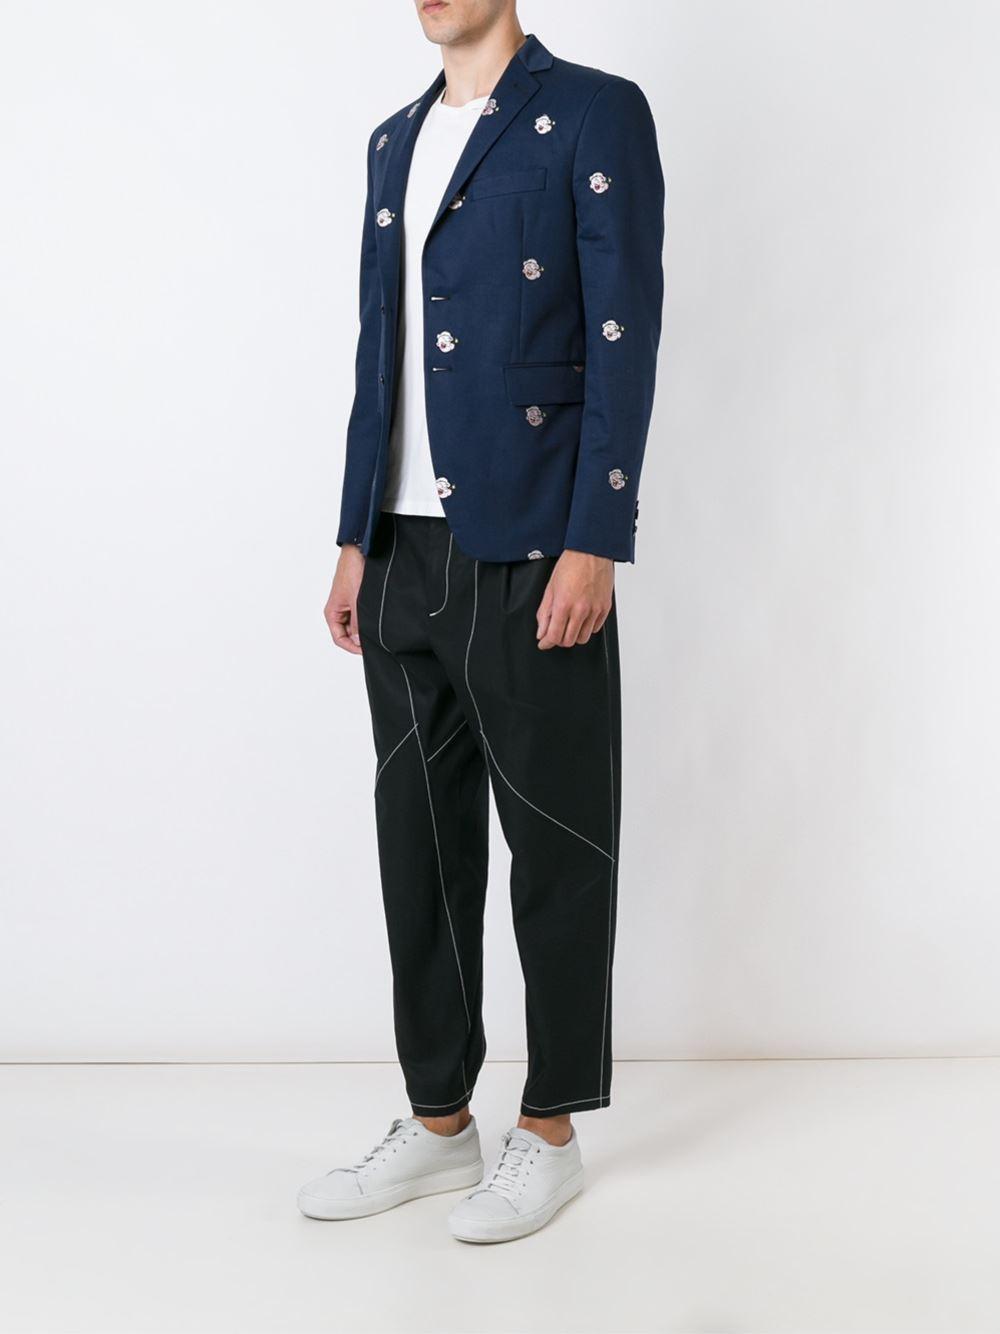 LC23 Cotton Popeye Blazer in Blue for Men